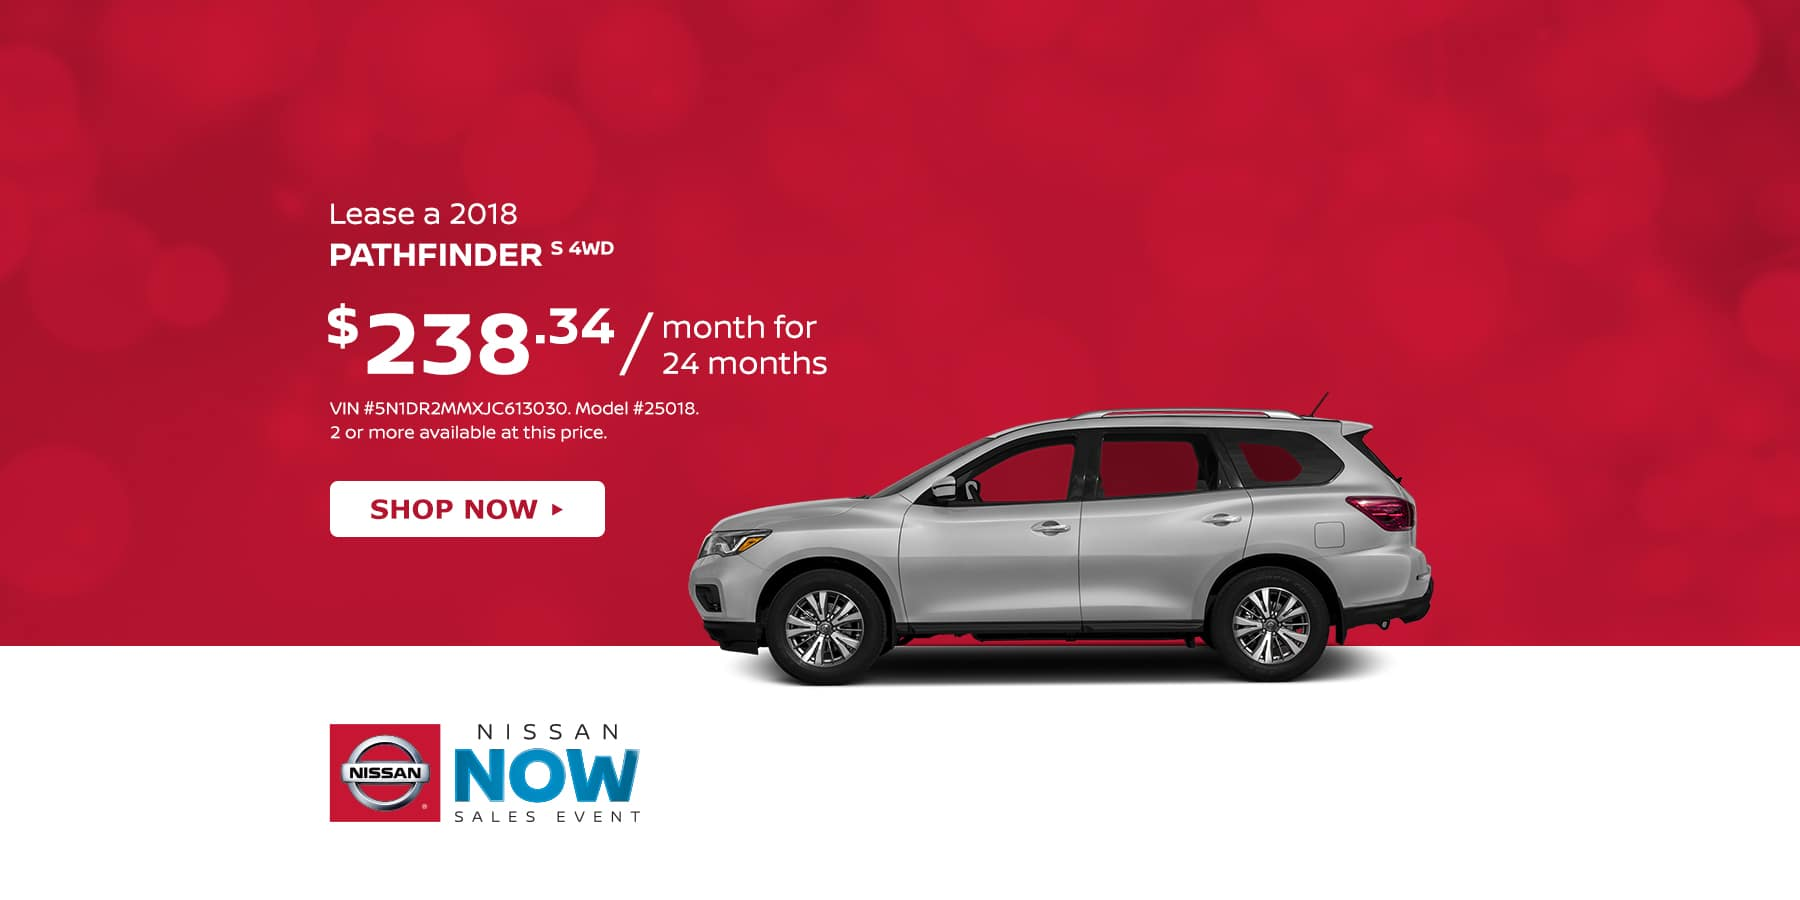 Tamaroff Nissan February Pathfinder Offer